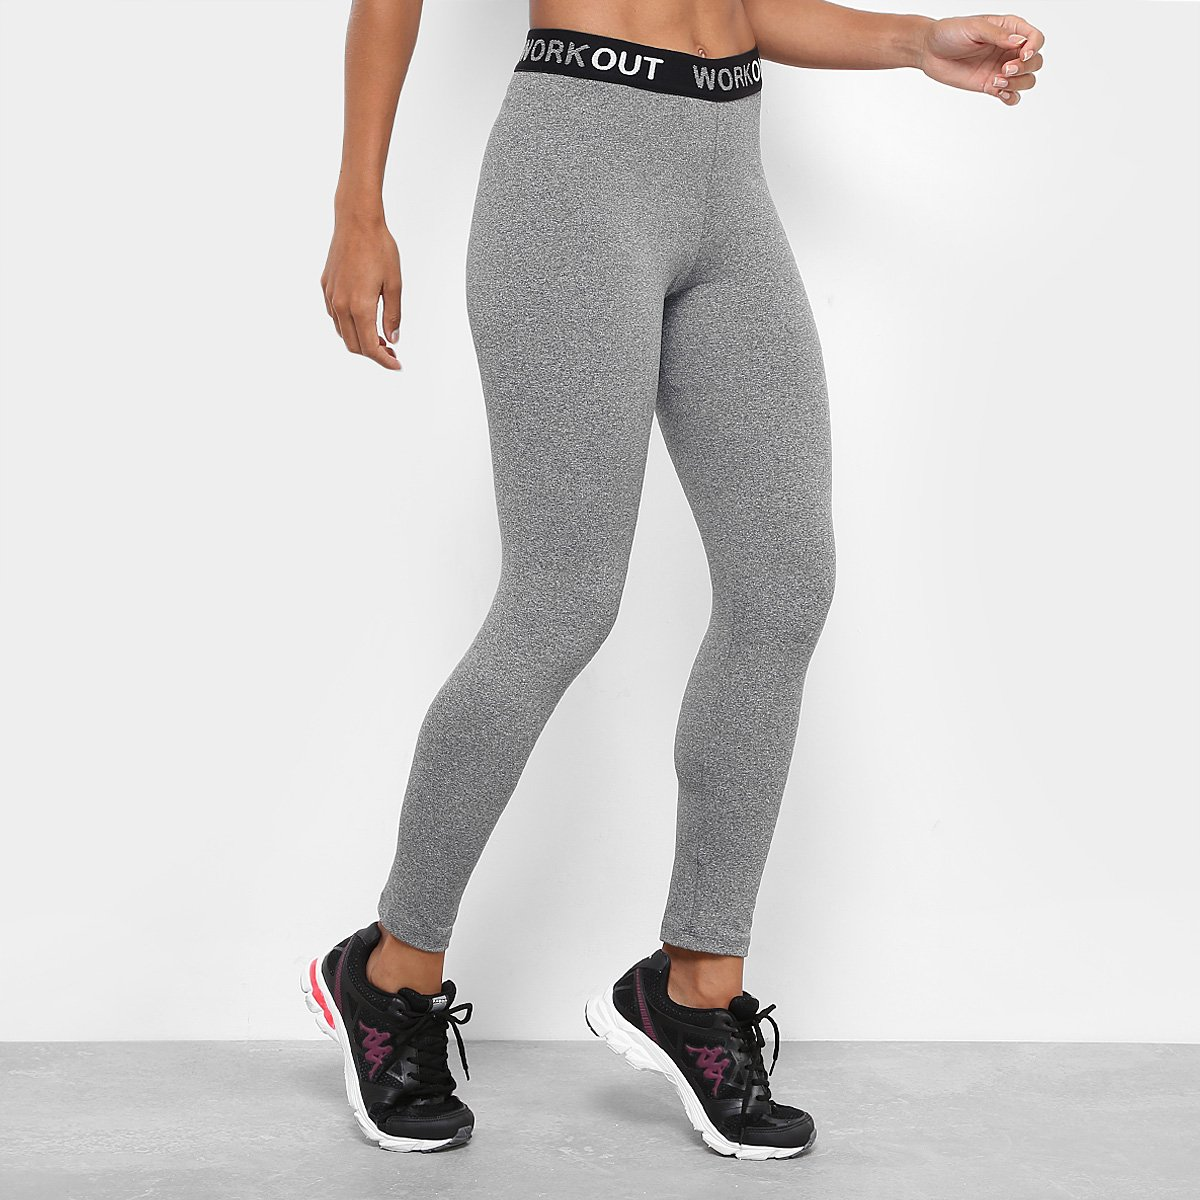 Calça Legging Gonew Workout Mescla Feminina Legging Calça aOSznHw